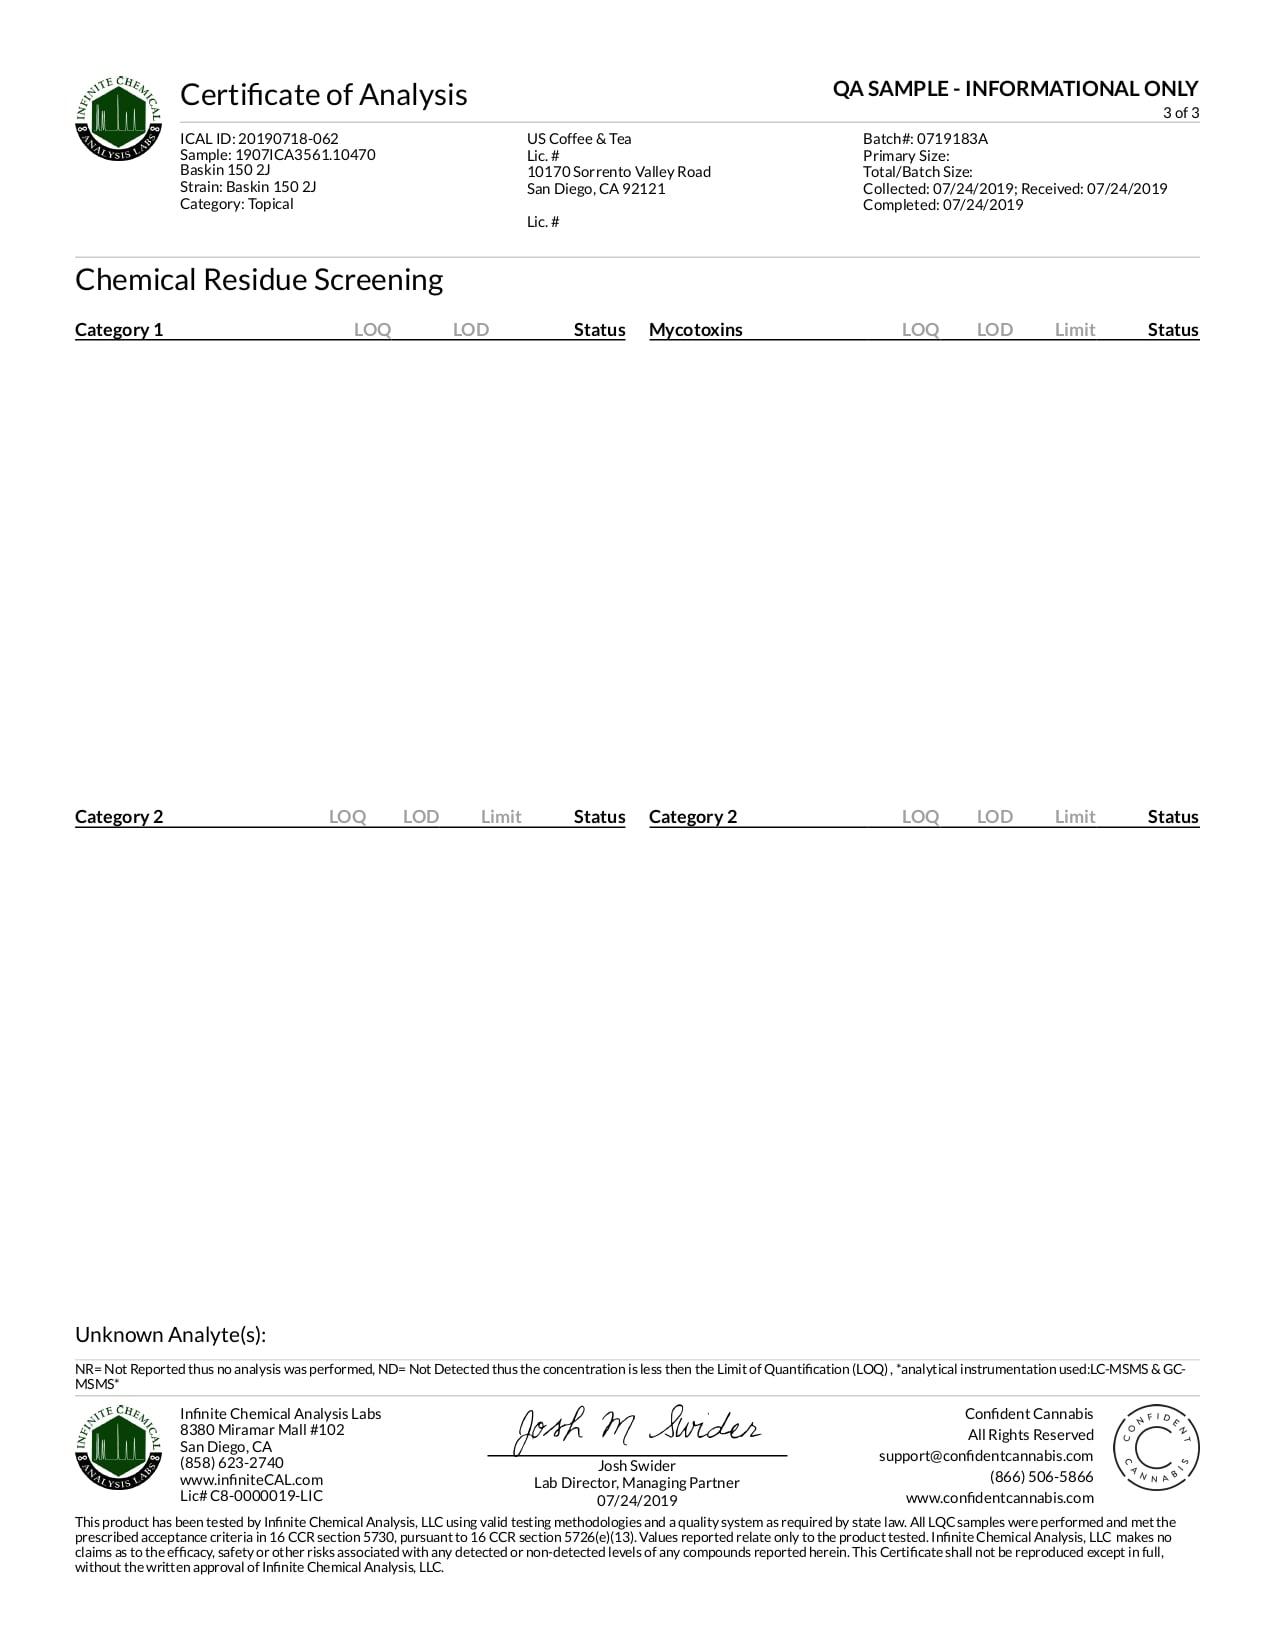 Baskin CBD Topical Skin Relief Cream Lab Report